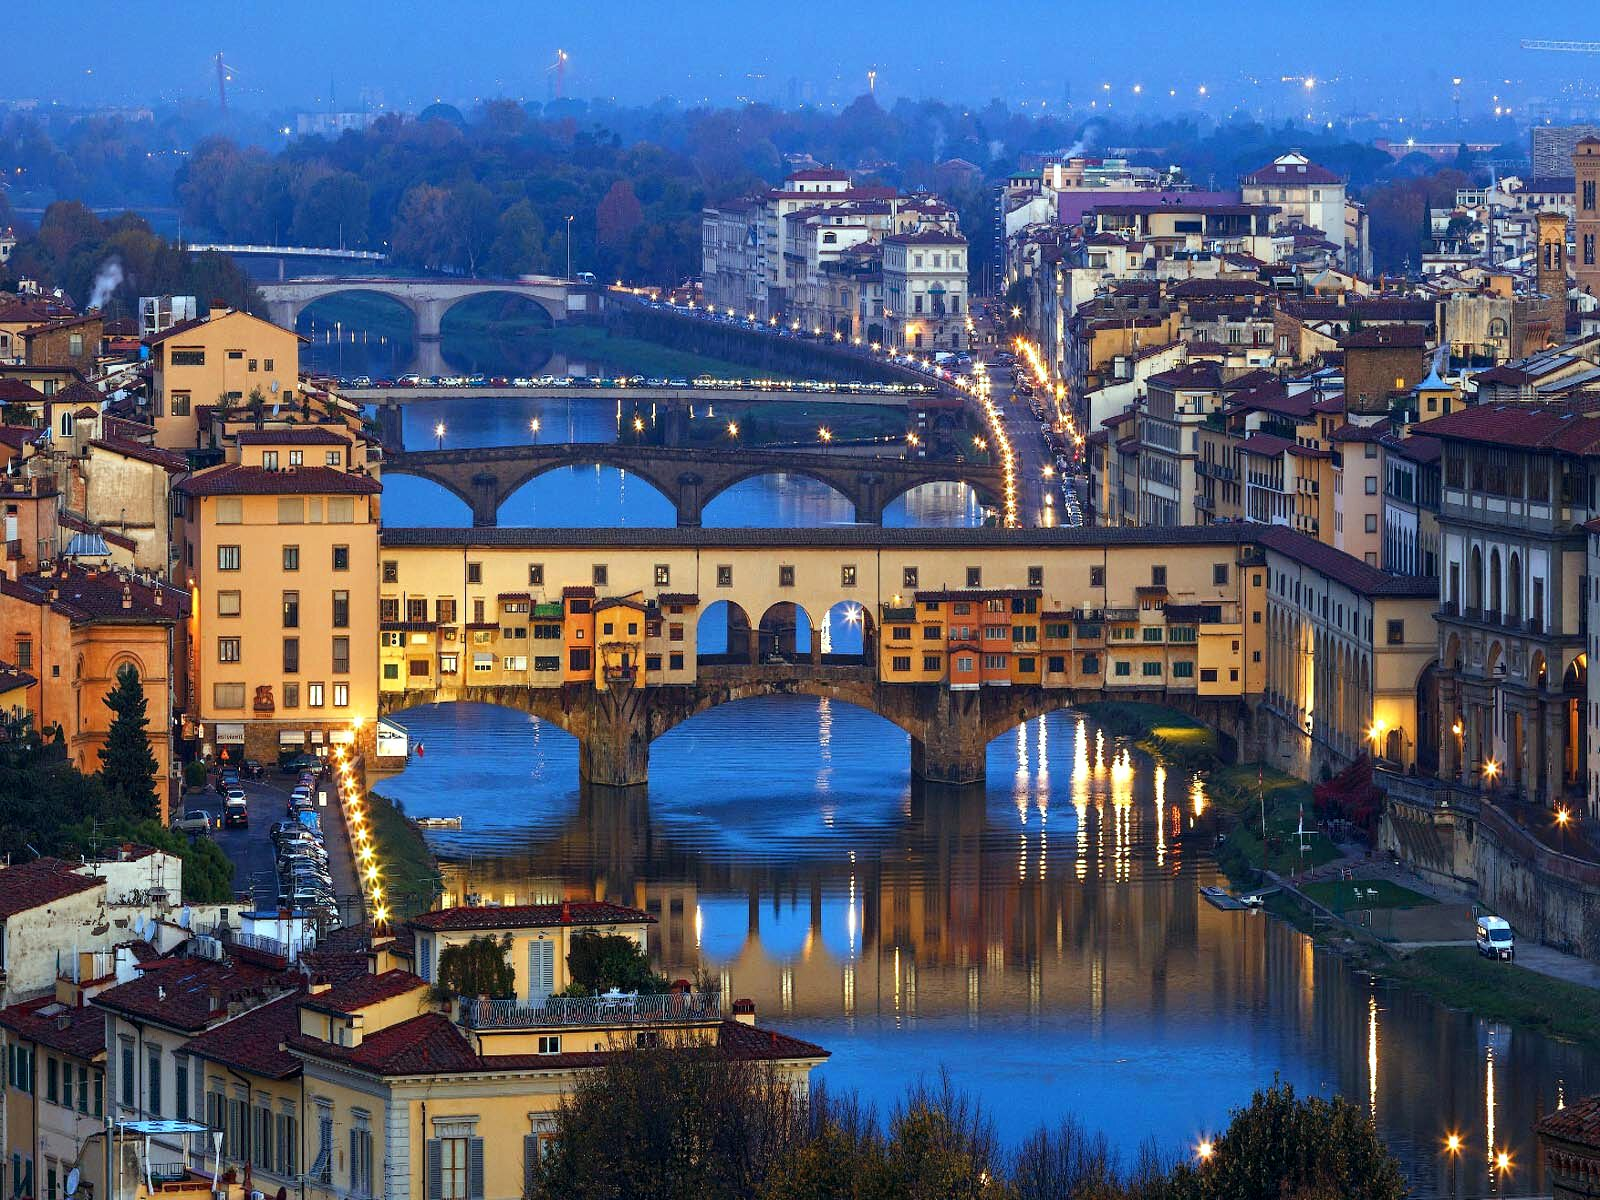 toscana__10a_firenze_ponte-vecchio_127